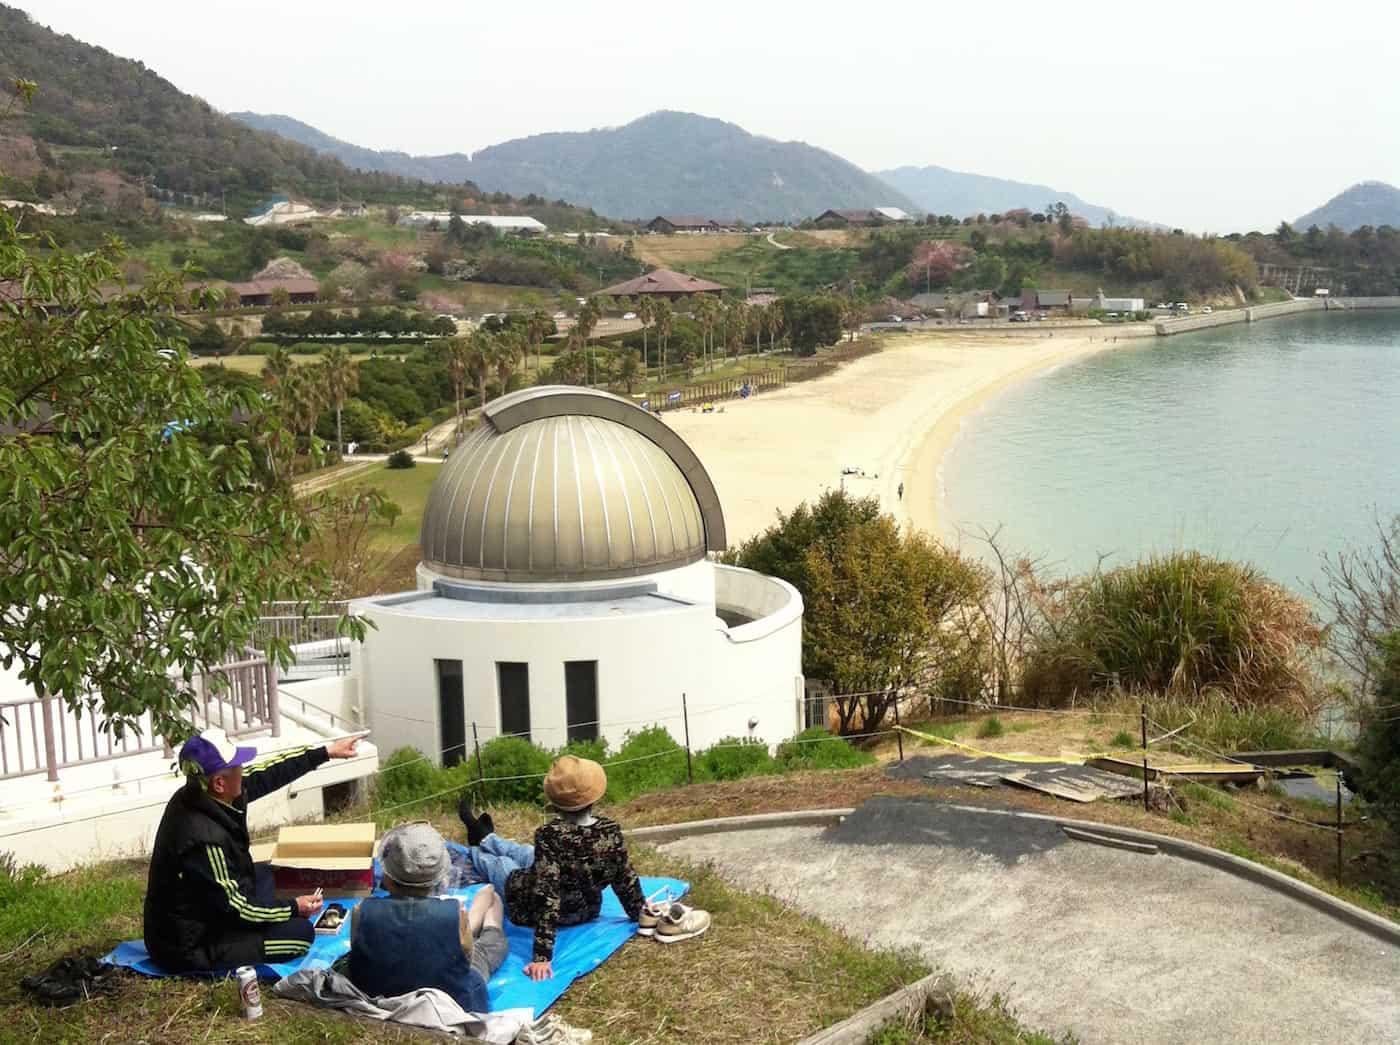 kenmin-no-hama beach park kamagari in hiroshima